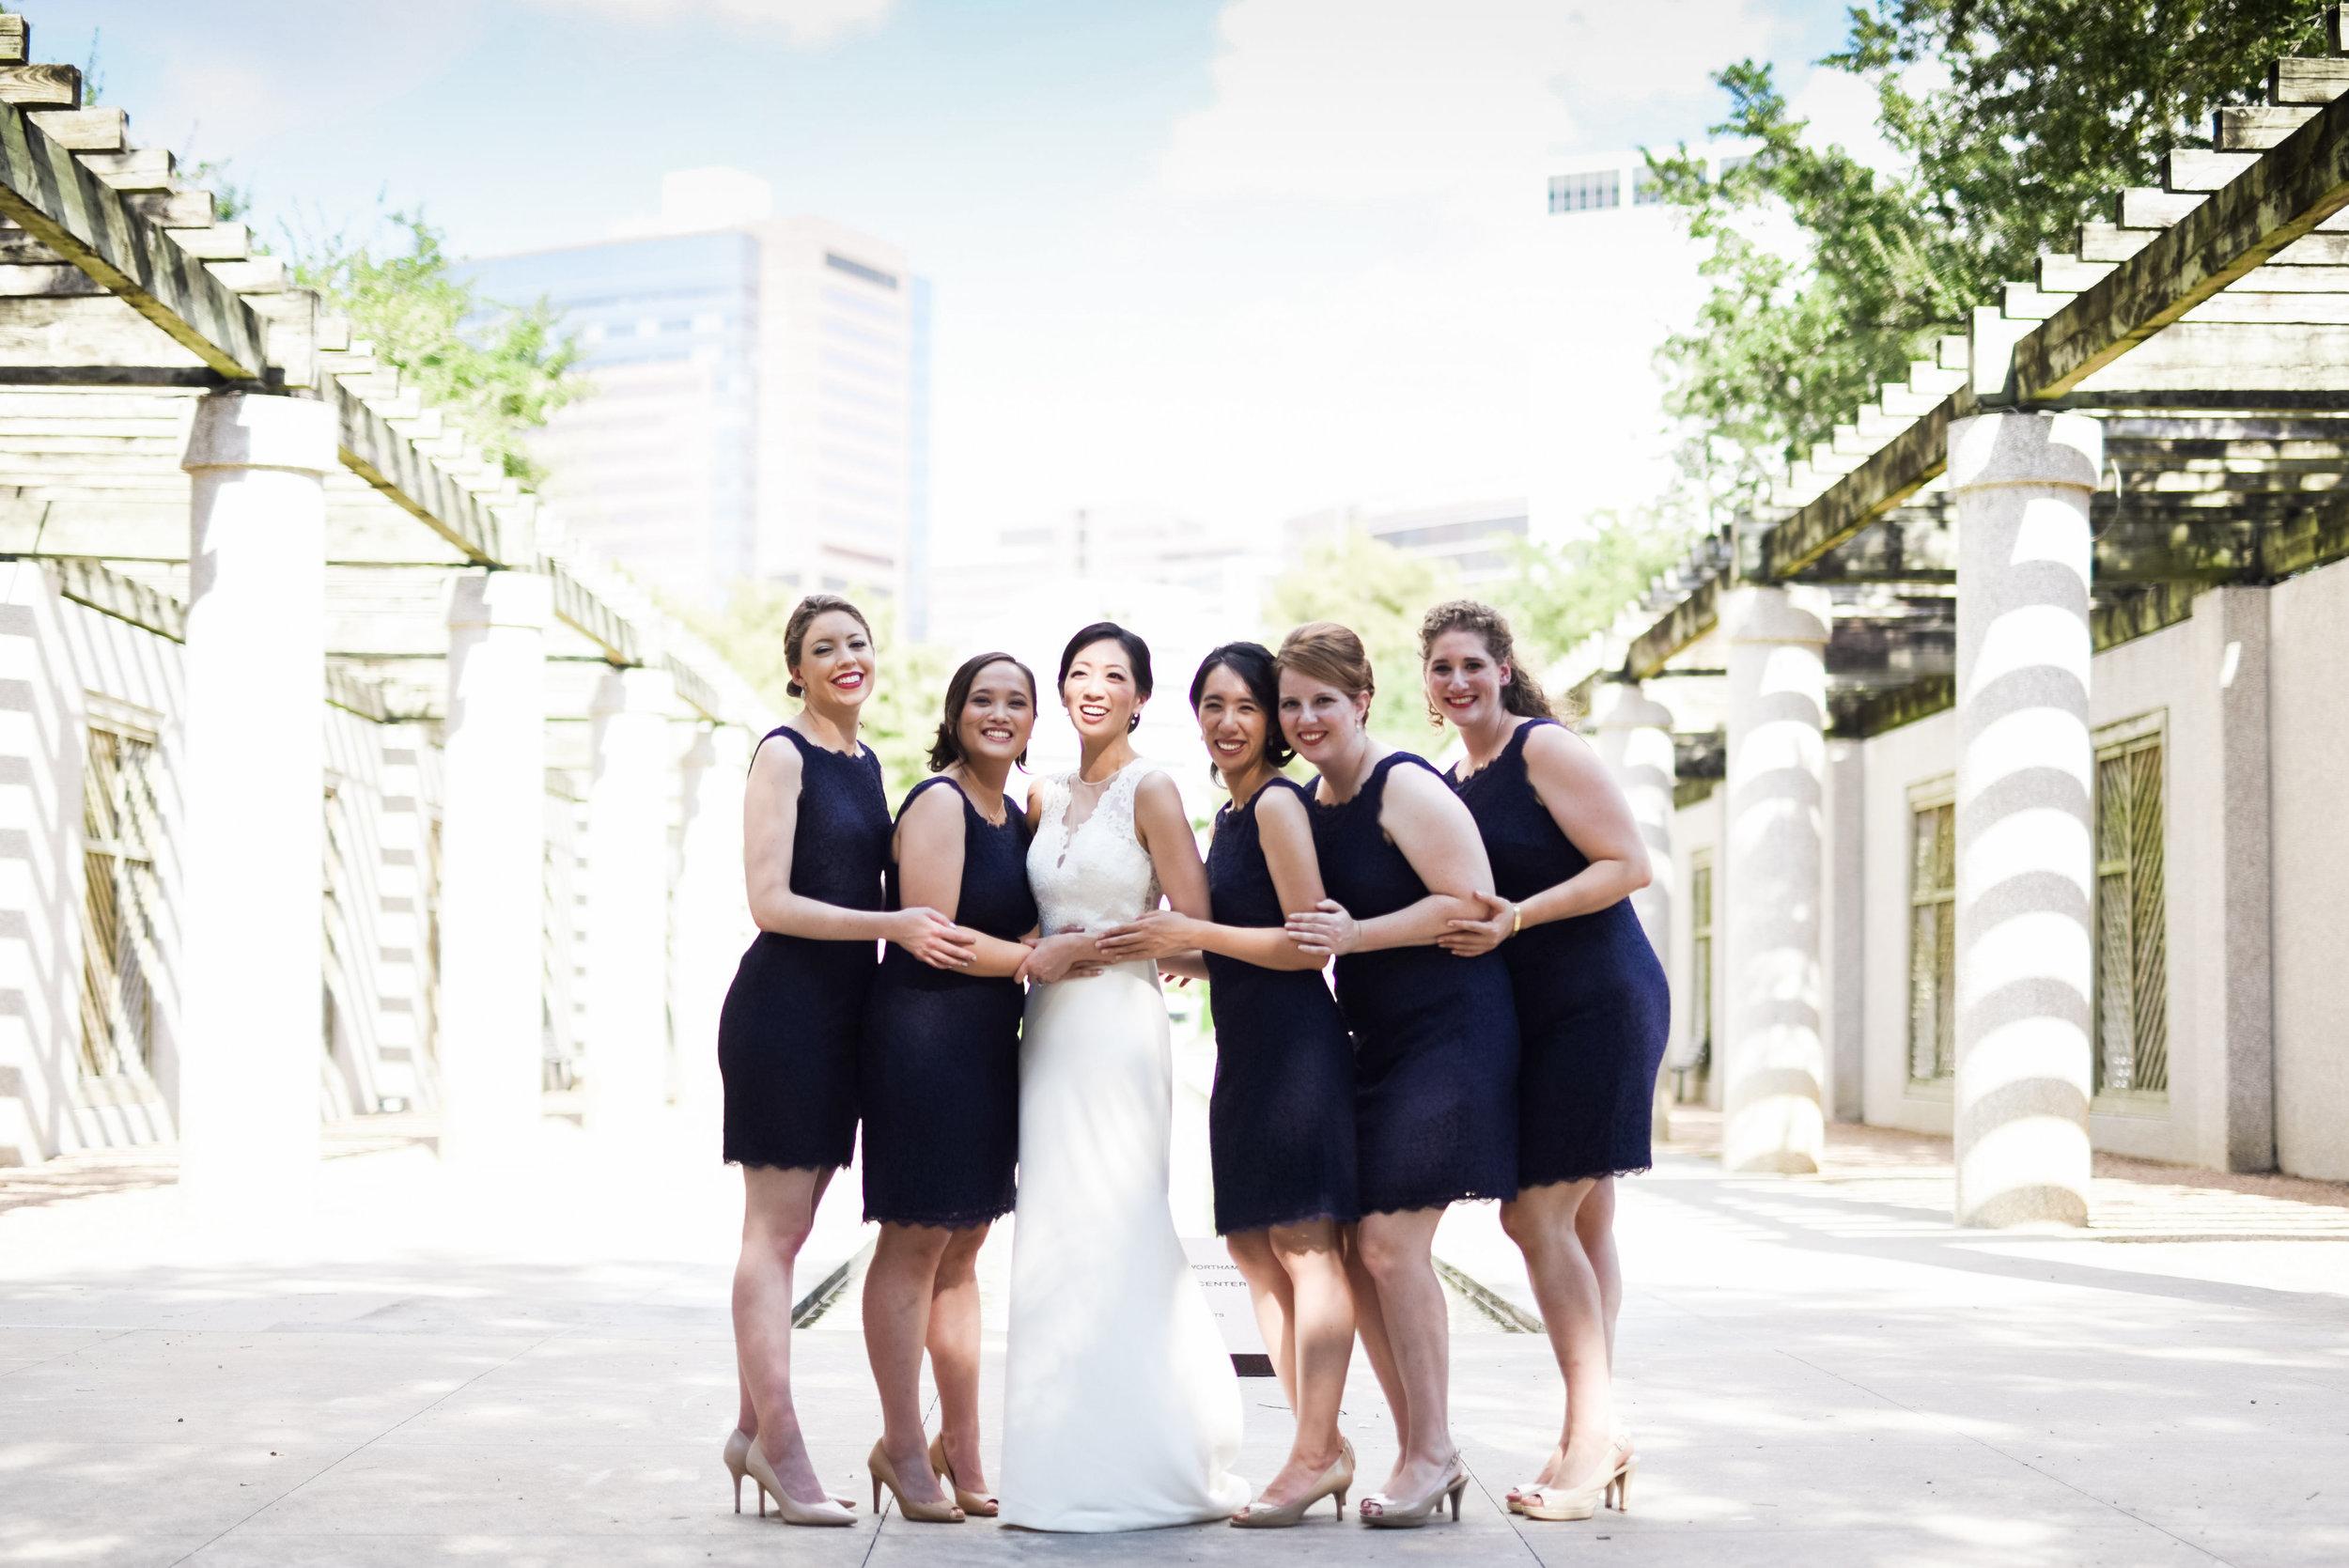 Houston Wedding- Texas Wedding- Pharris Photography- Wedding Photography- Cathleen and Jeha- Bridal Party- Bridesmaids